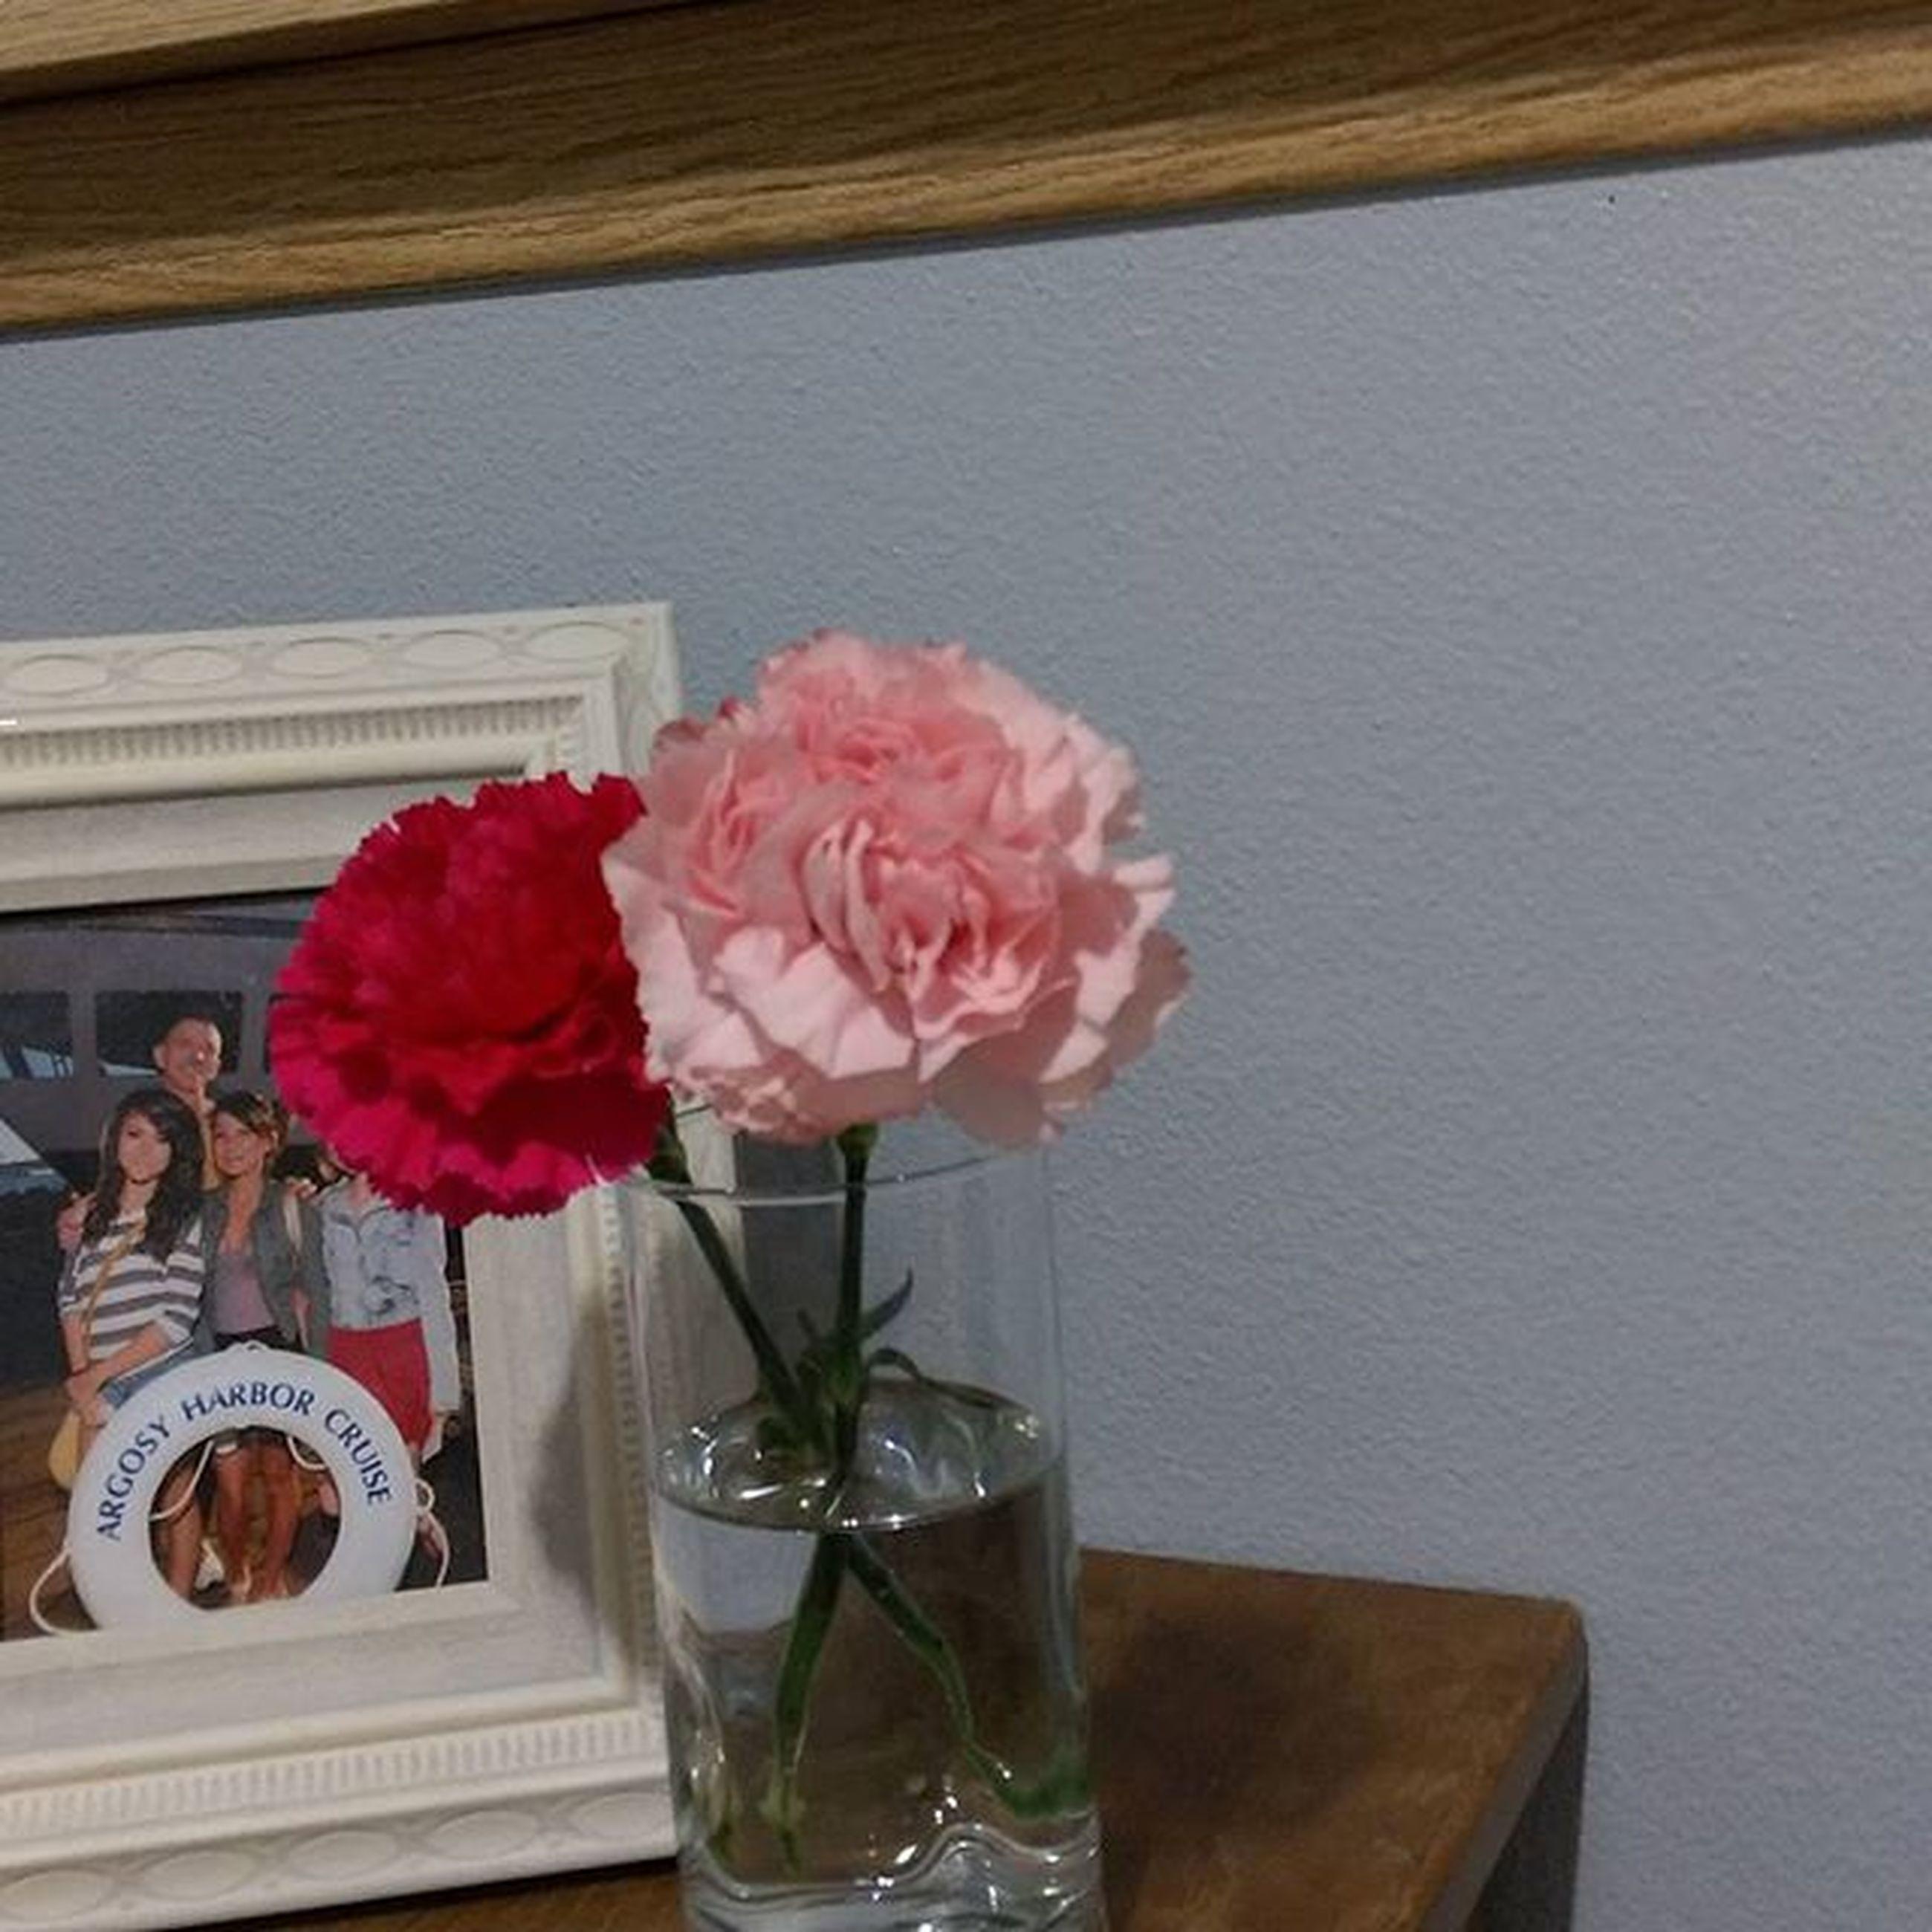 indoors, flower, table, freshness, vase, still life, glass - material, fragility, petal, drinking glass, food and drink, transparent, flower arrangement, close-up, rose - flower, drink, flower head, pink color, decoration, glass